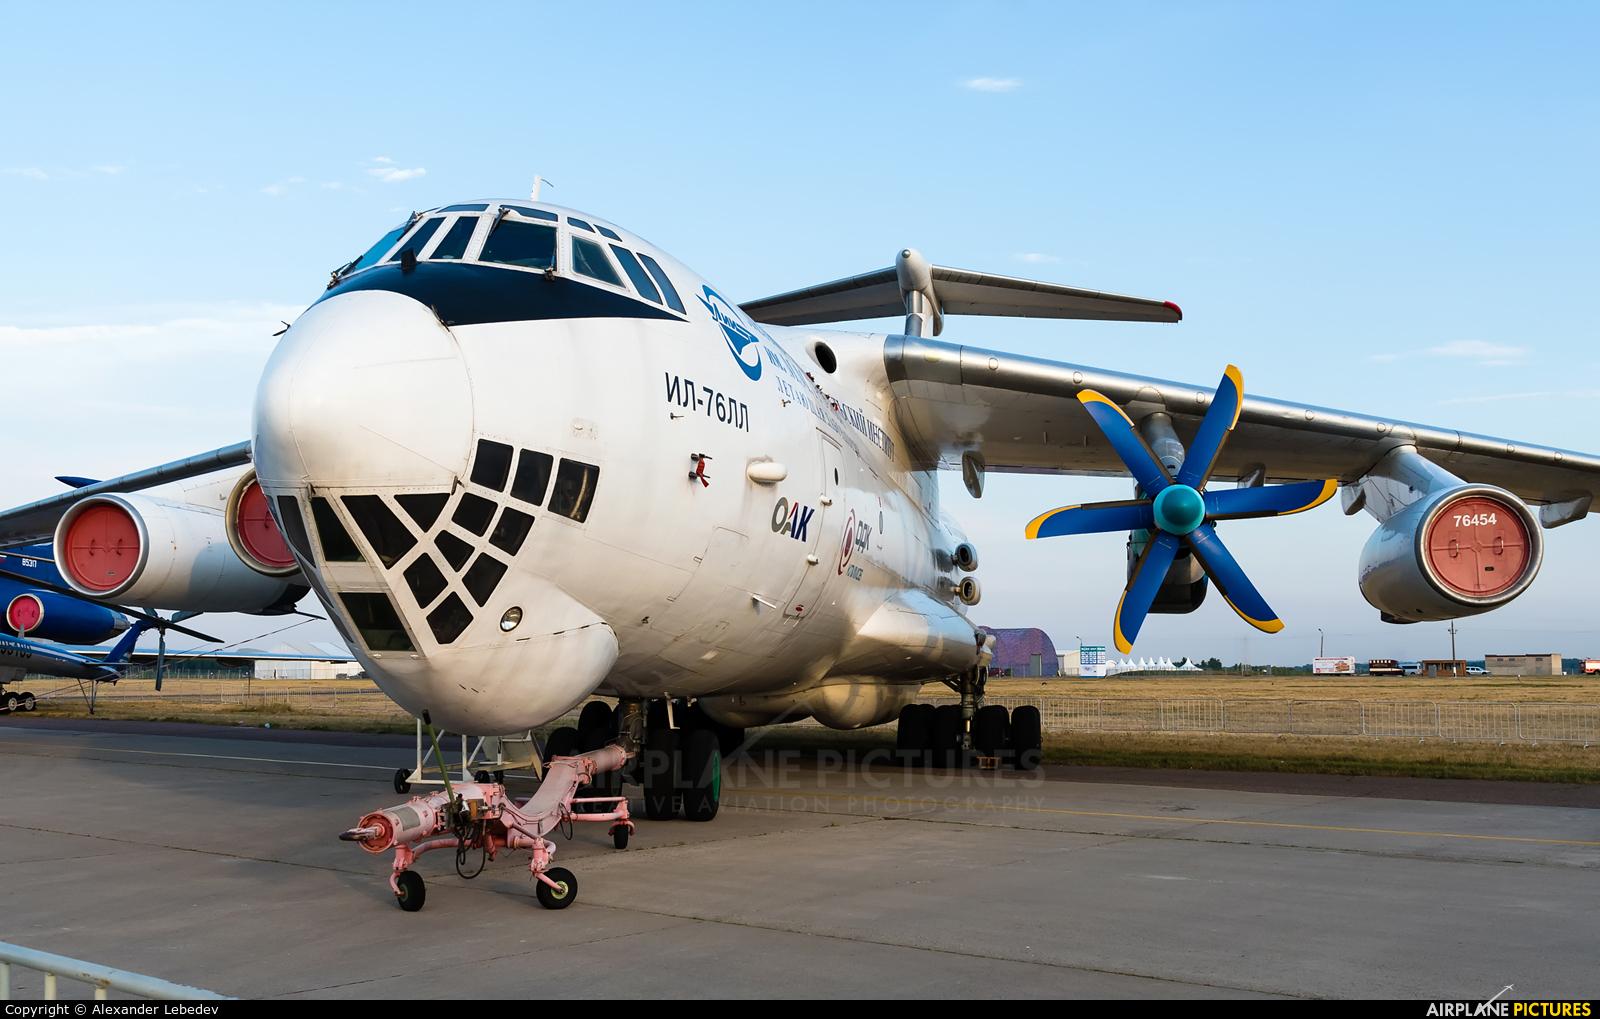 Gromov Flight Research Institute RA-76454 aircraft at Zhukovsky International Airport